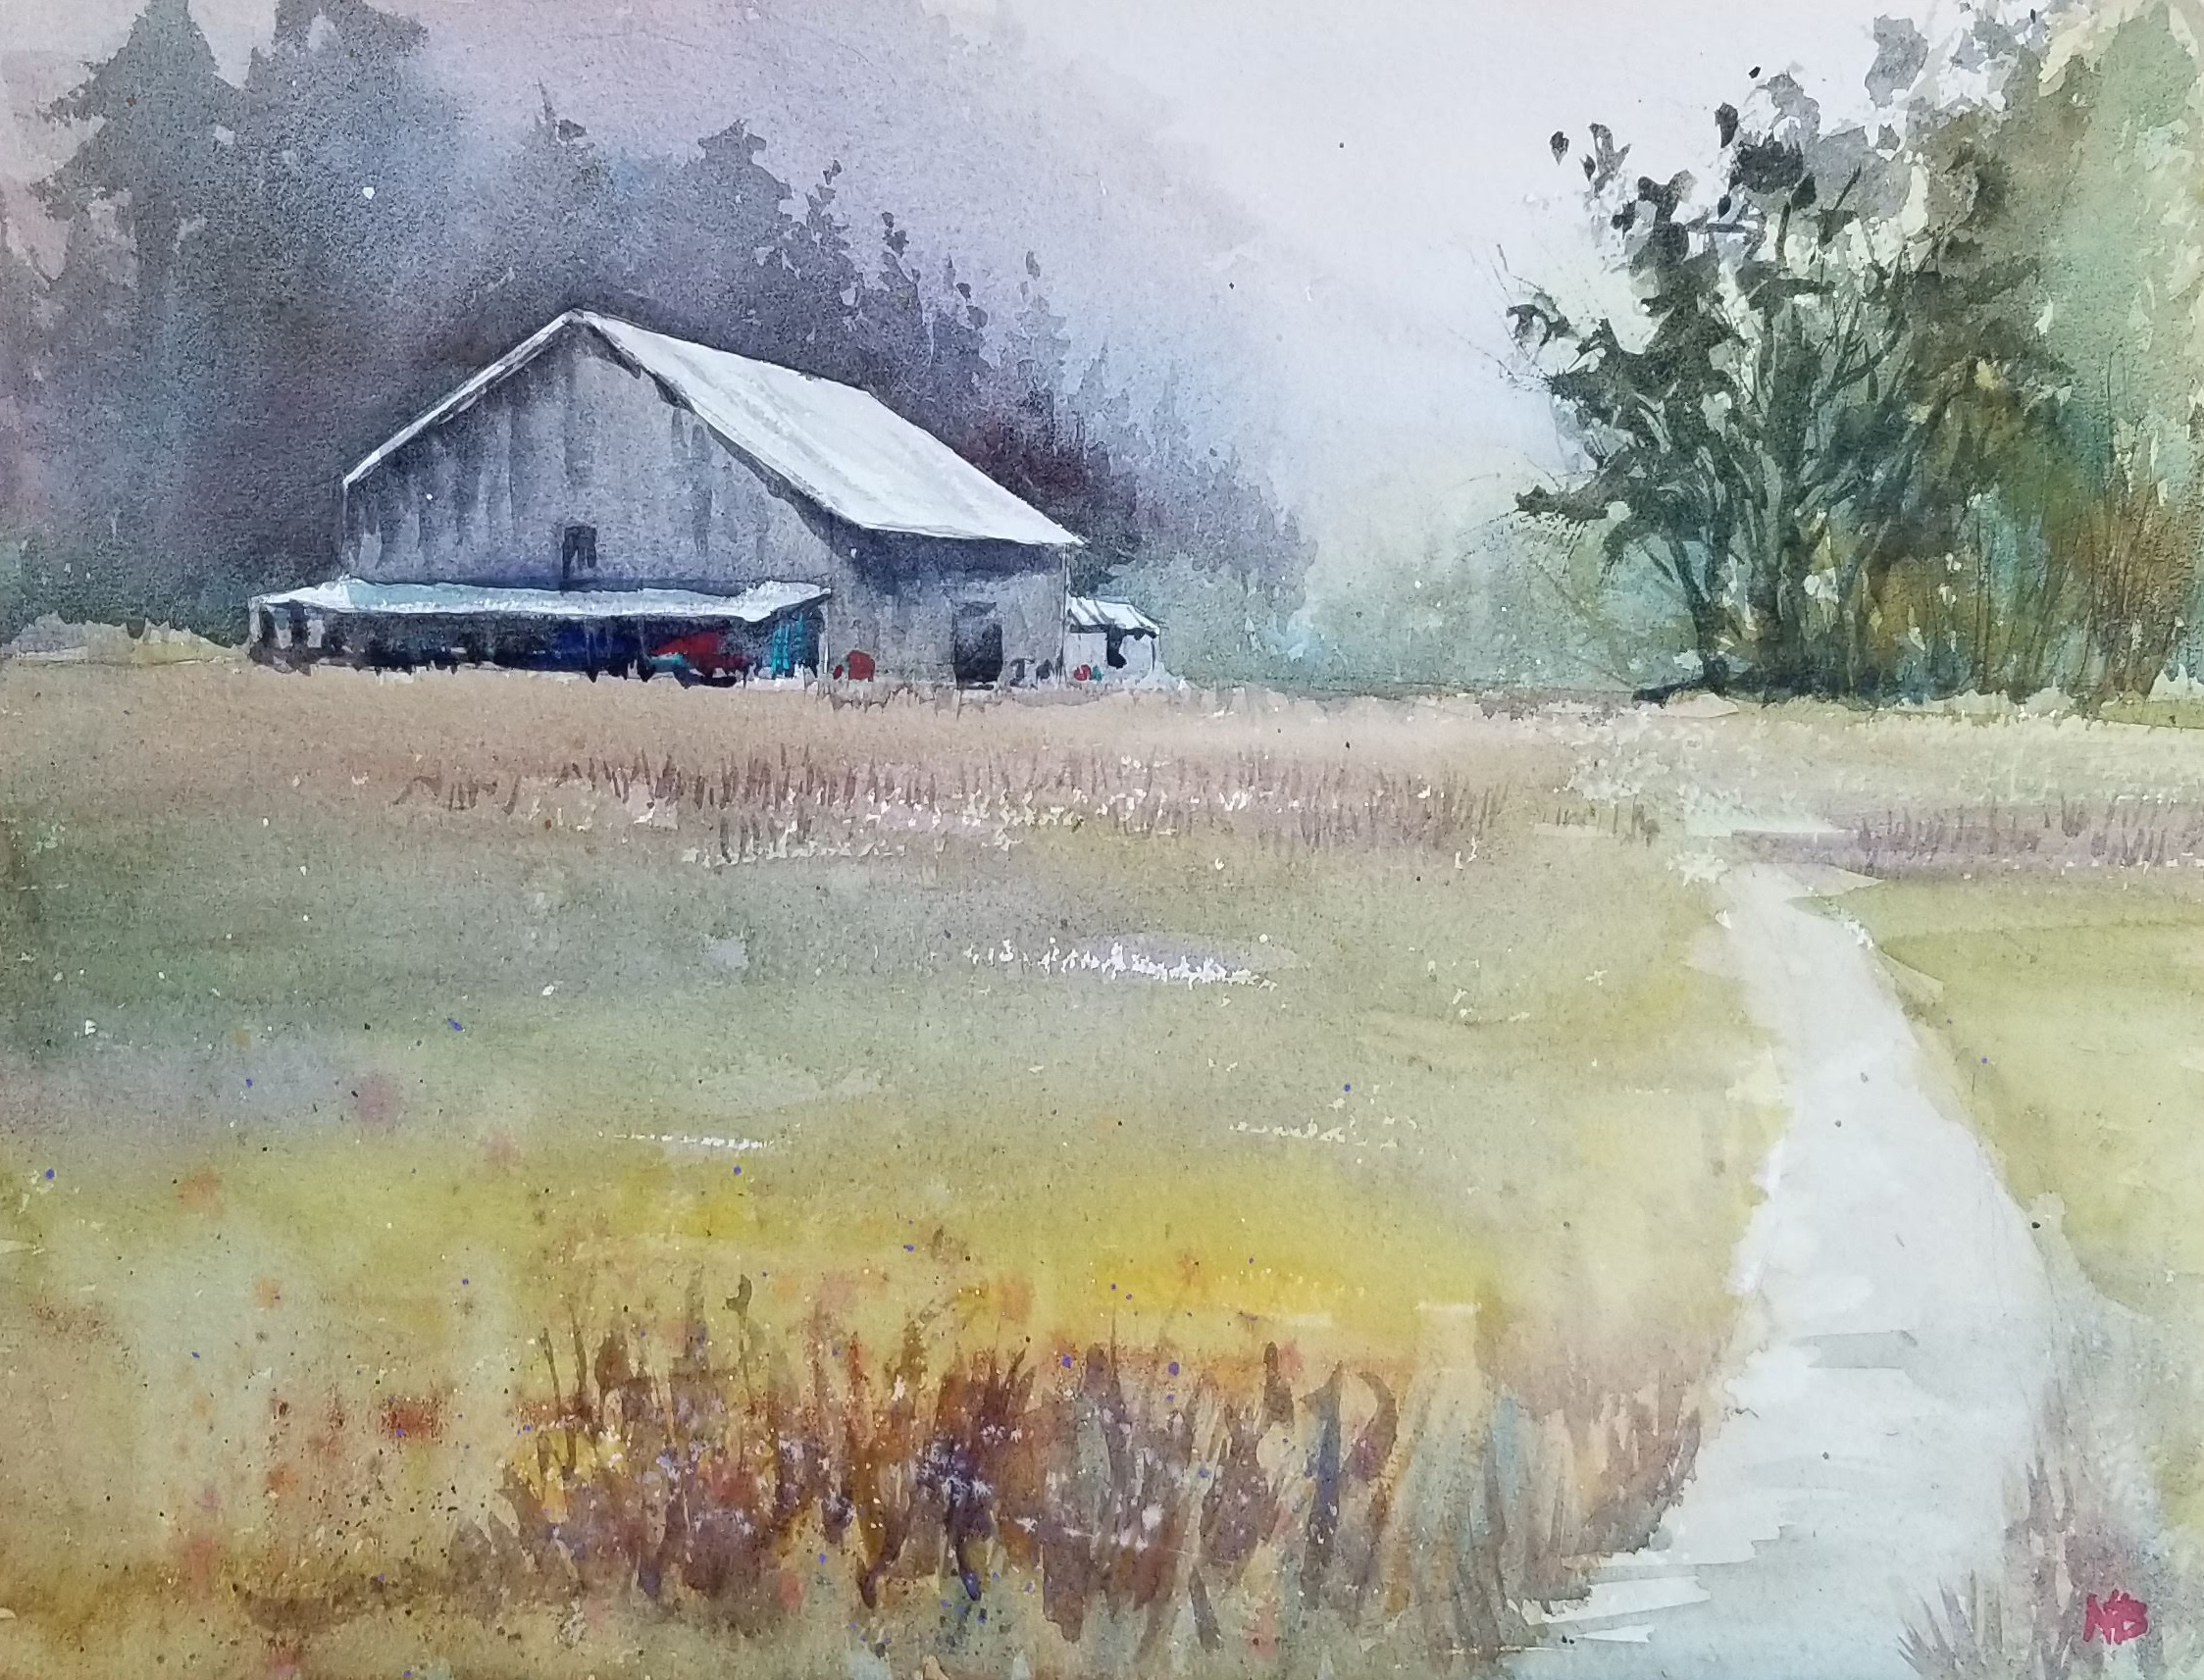 Lonesome barn-12x16 by Nancy Boyle.jpg